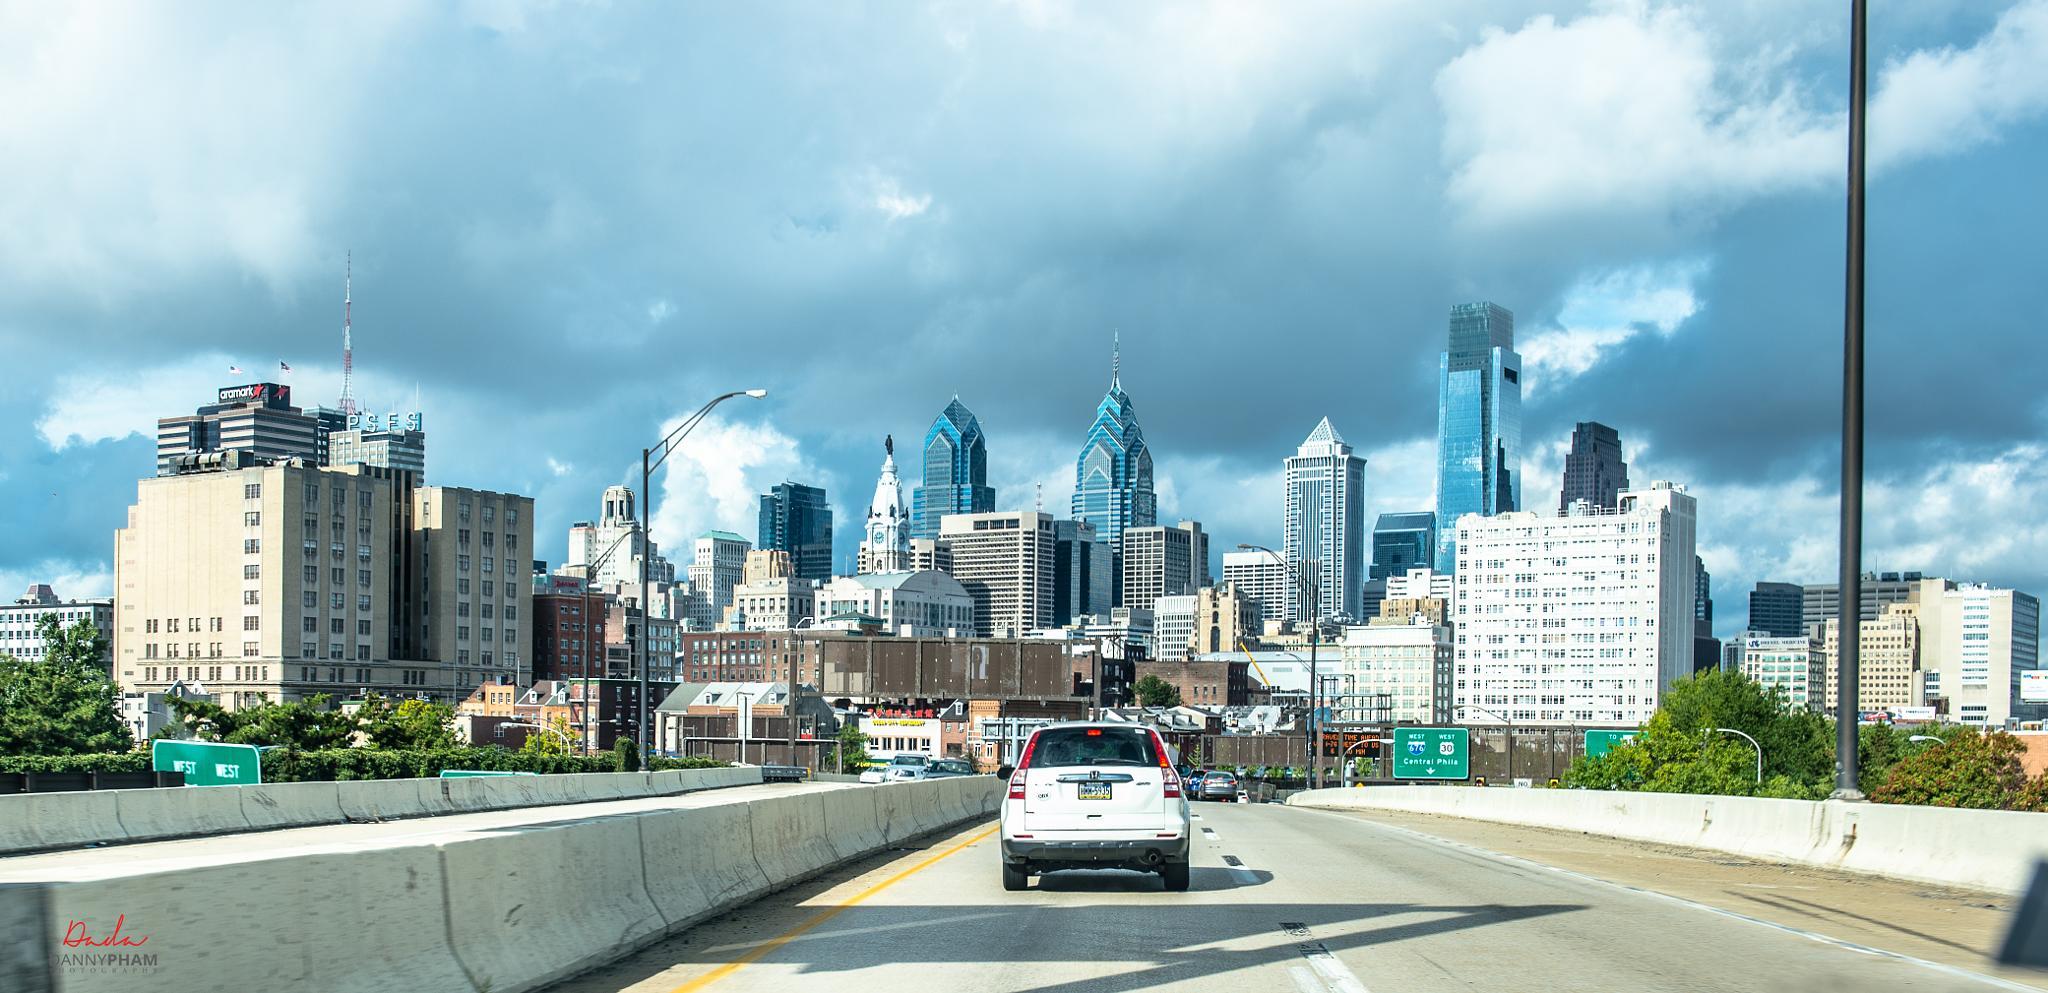 Downtown - Philadelphia  by Danny Pham